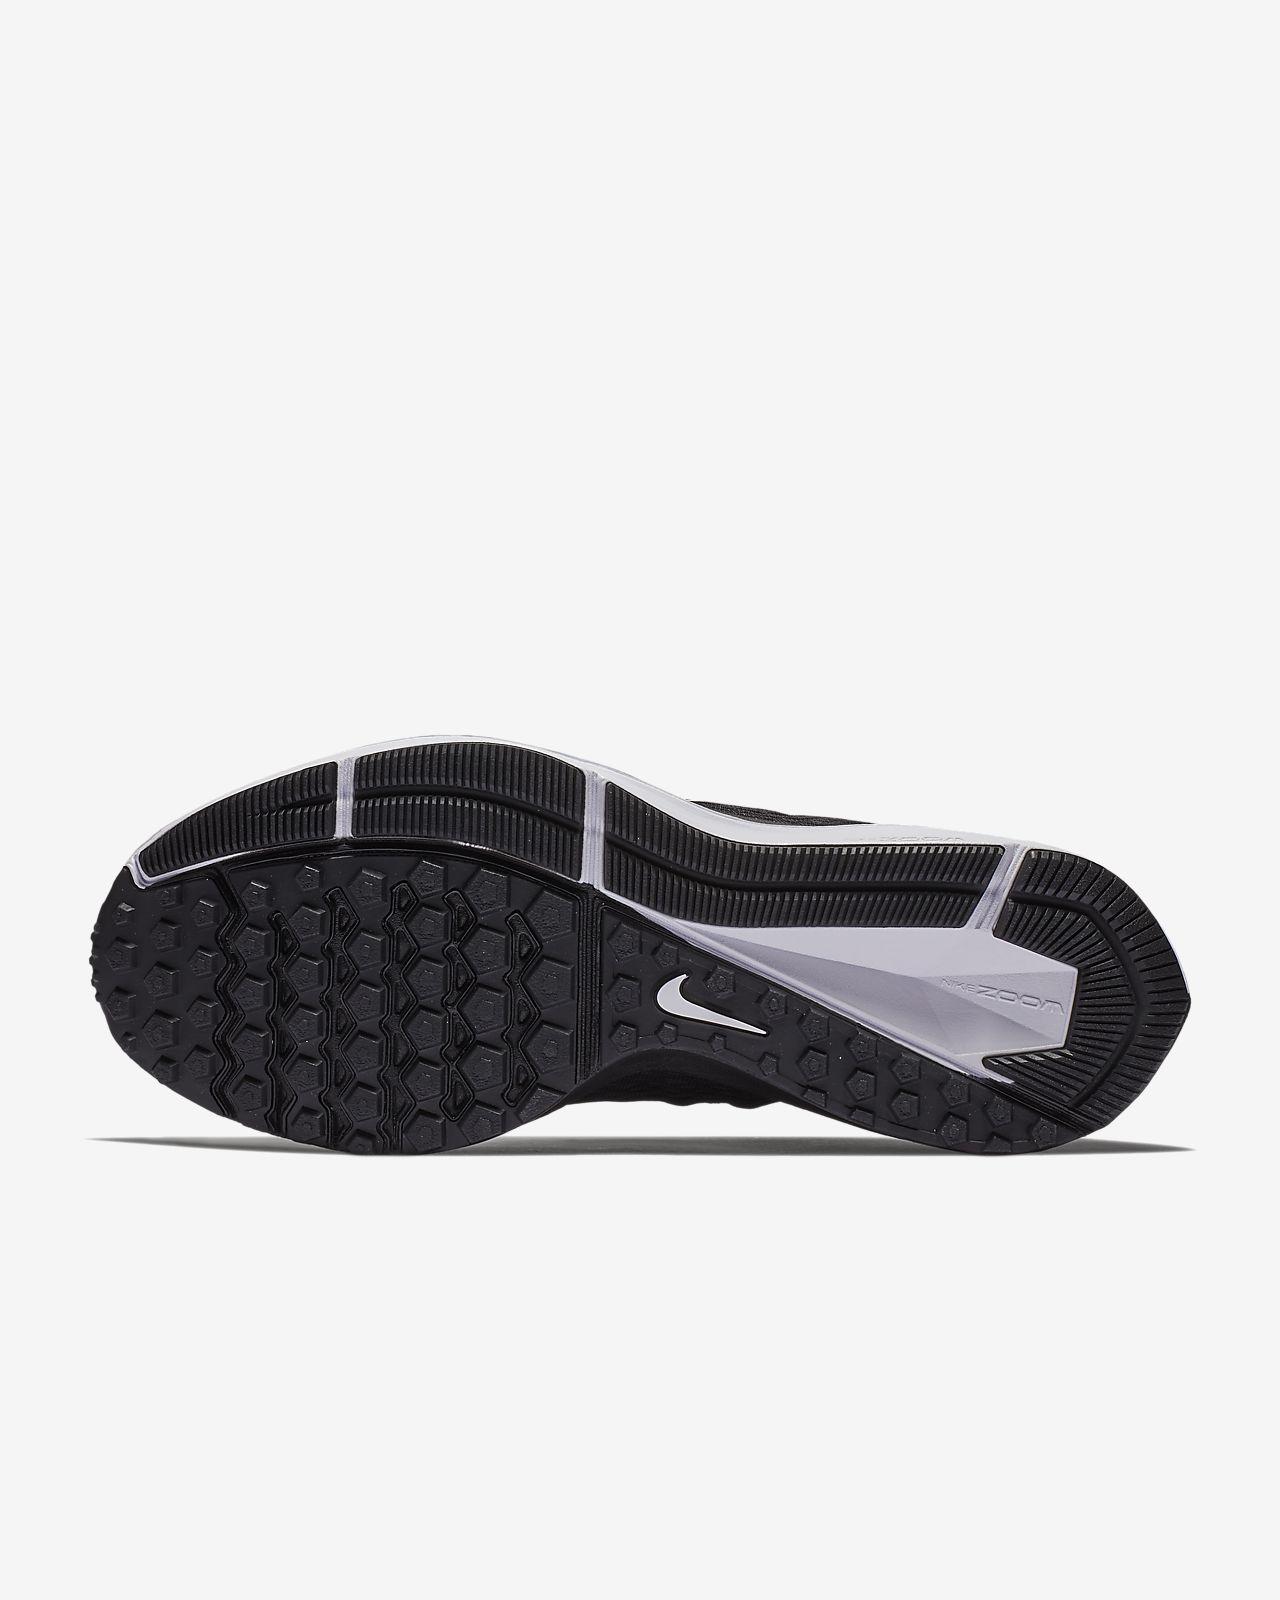 4bbc3092ec3 Nike Air Zoom Winflo 5 Men s Running Shoe. Nike.com IE